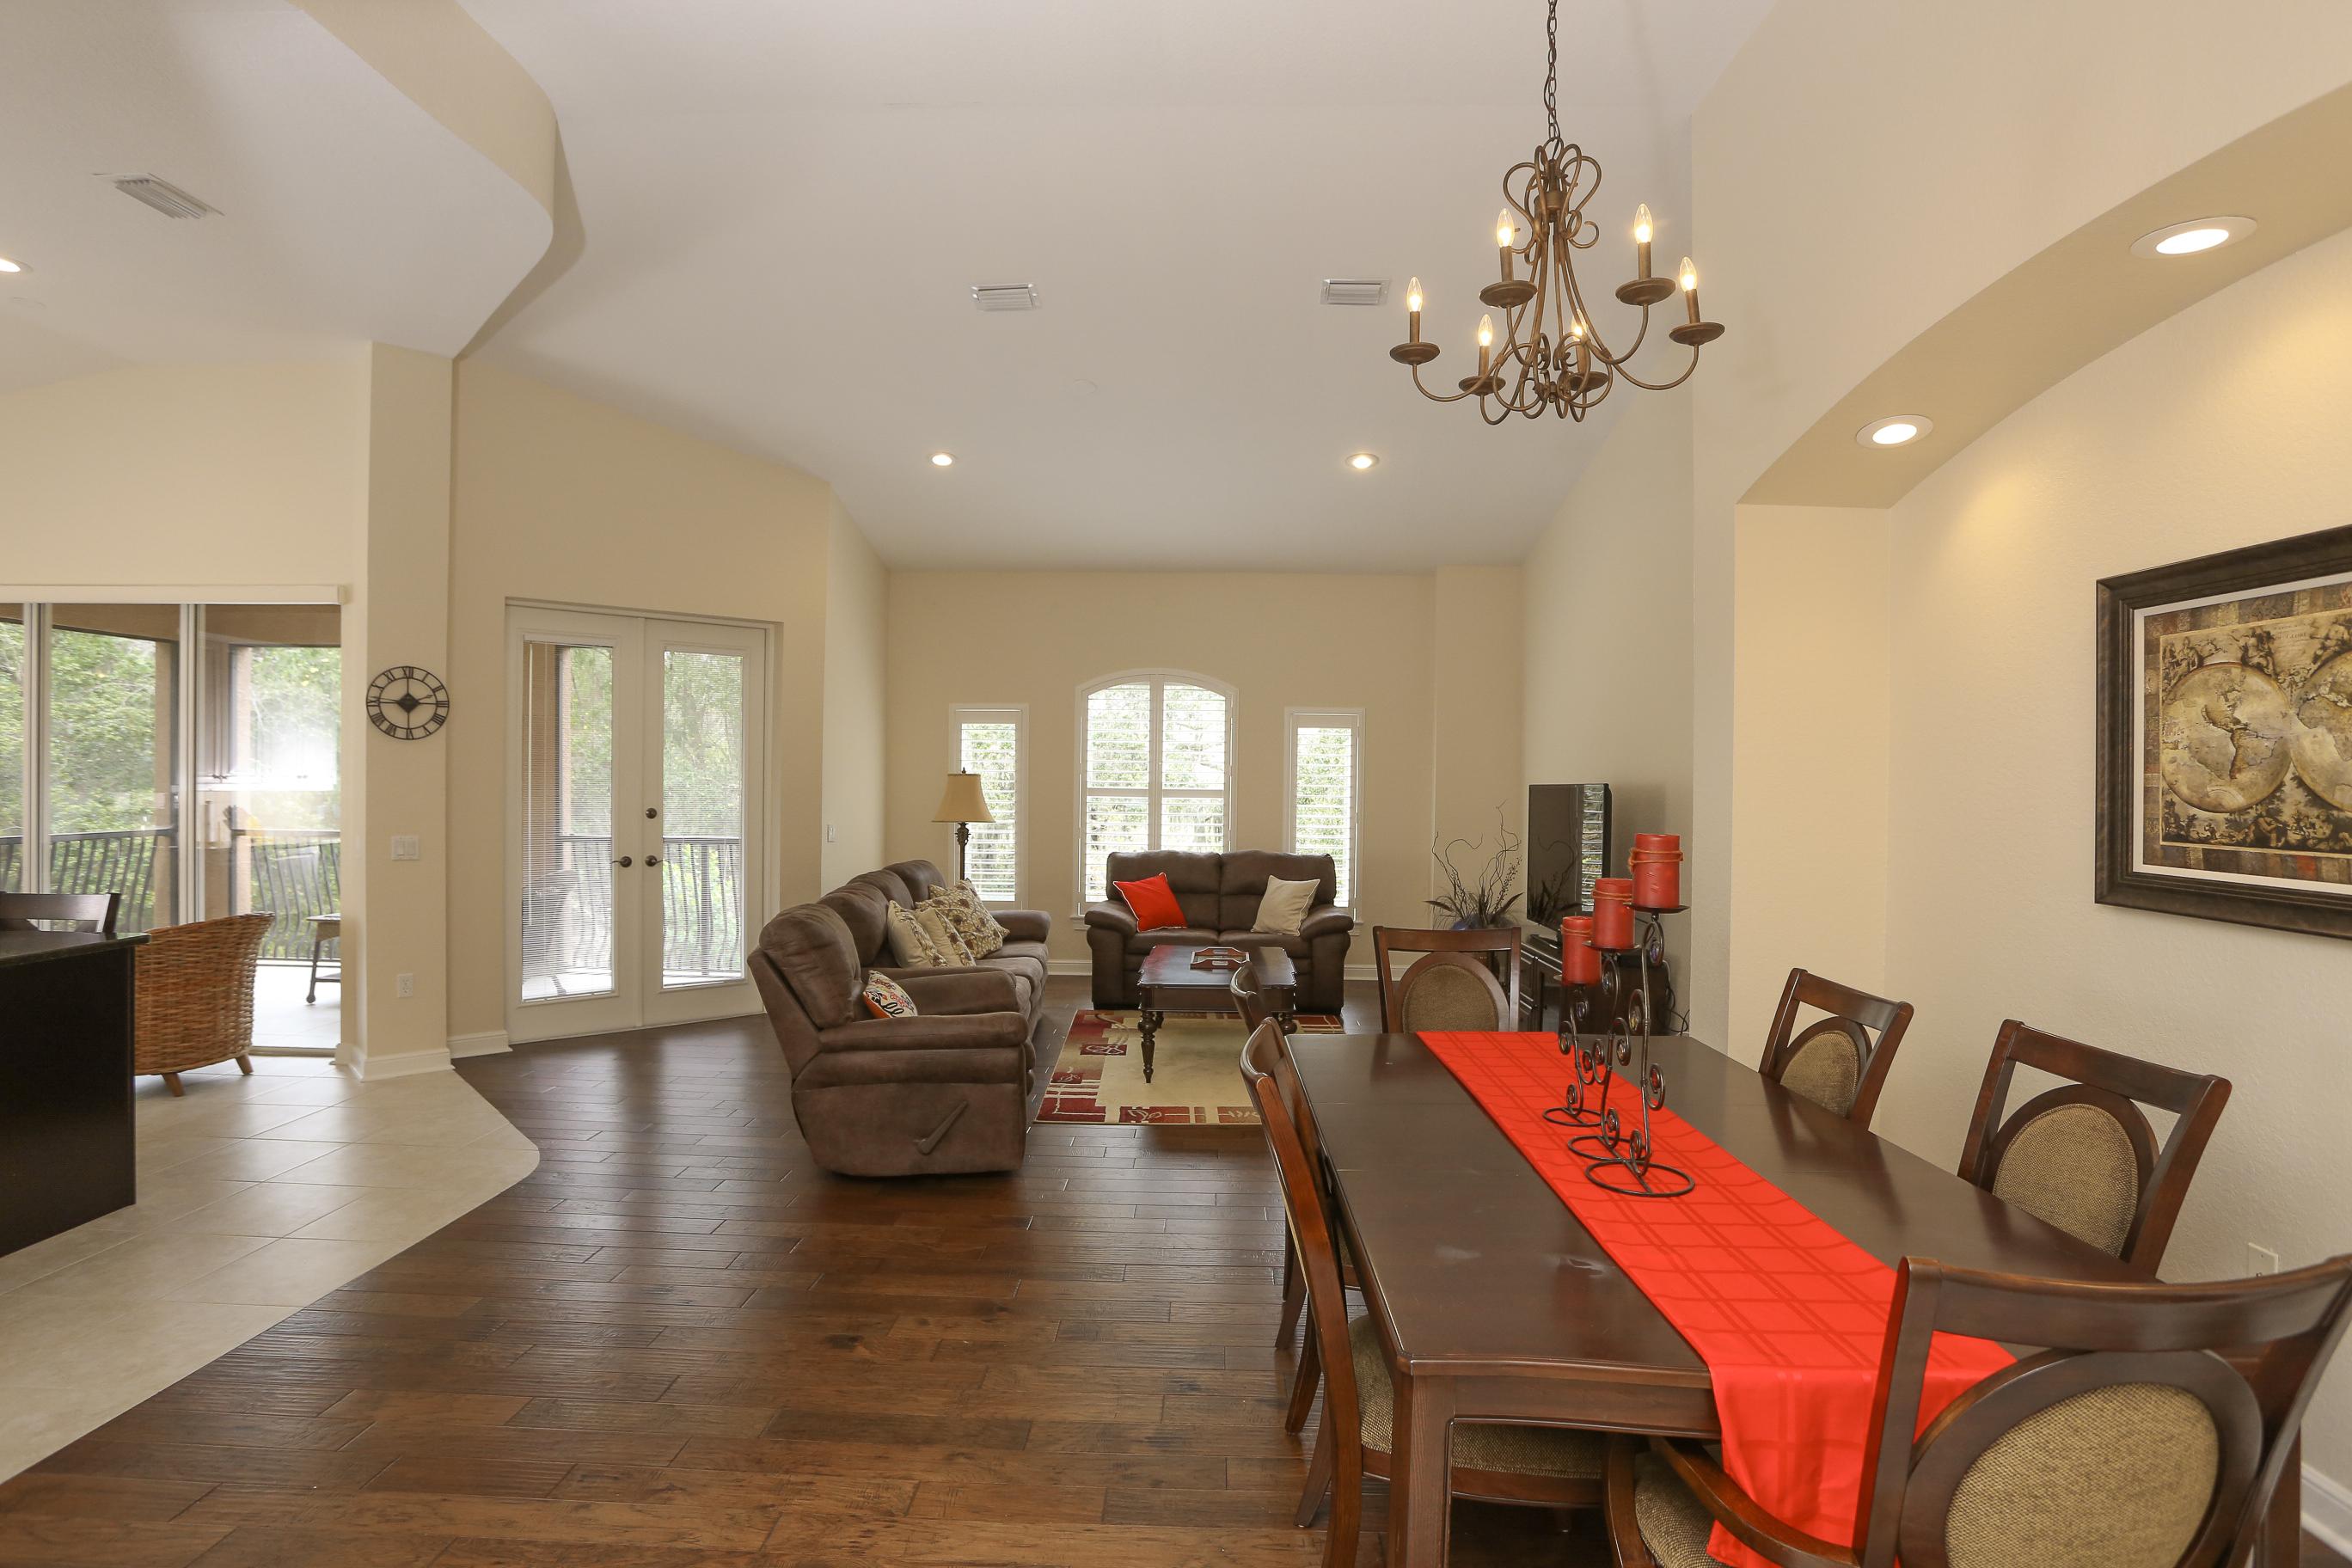 Additional photo for property listing at 5509 46th Ct W, Bradenton, FL 34210  Bradenton, Florida,34210 United States